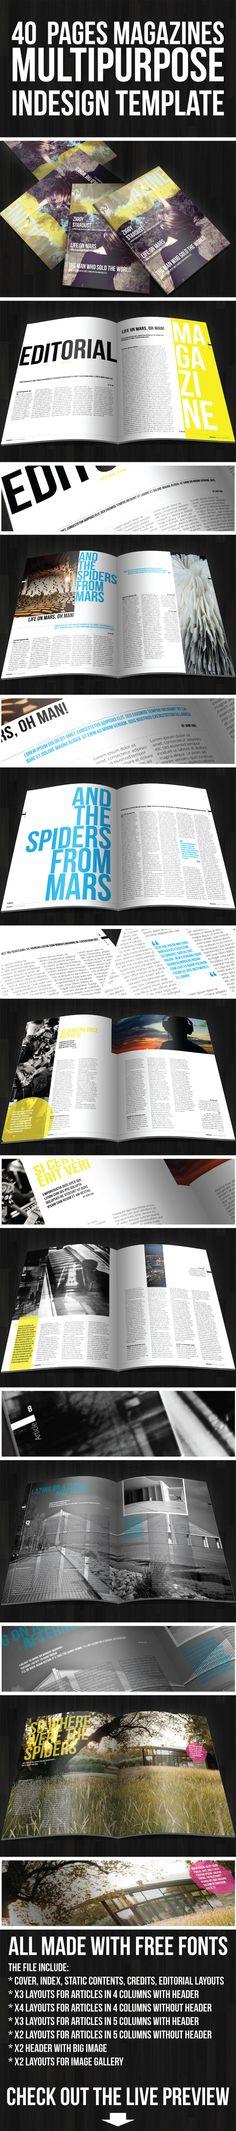 40 pages multipurpose magazine - Editorial Design on Creattica: Your source for design inspiration